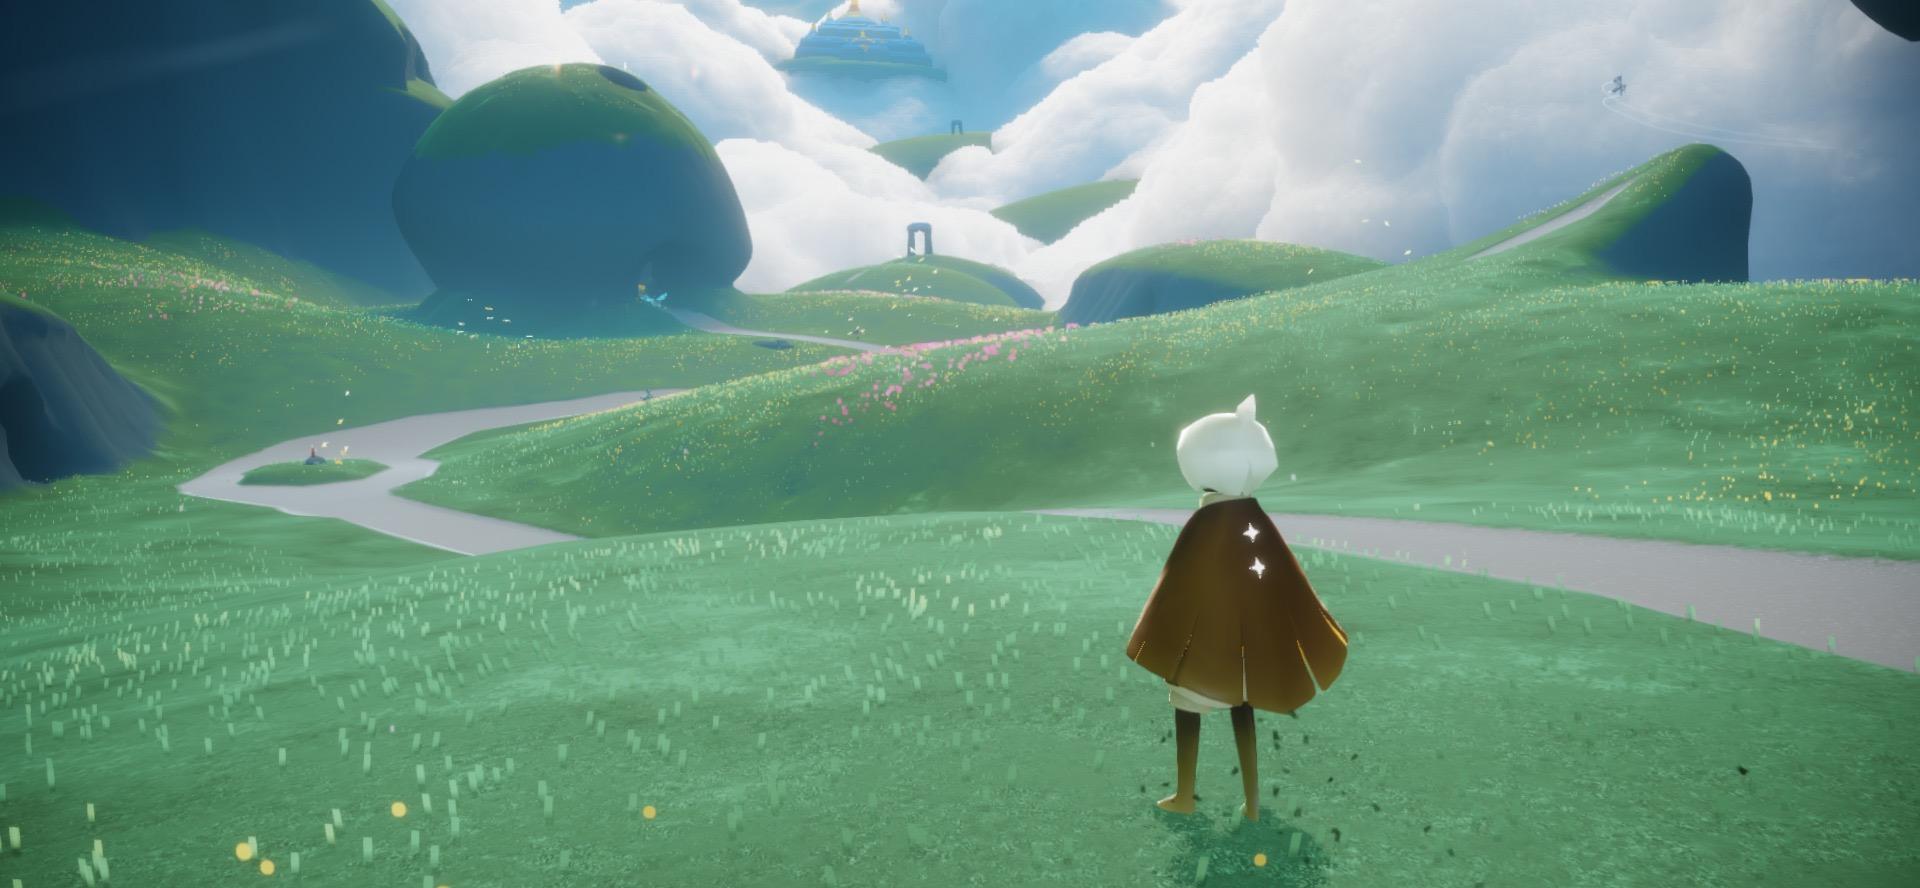 《Sky 光·遇》游戏截屏。